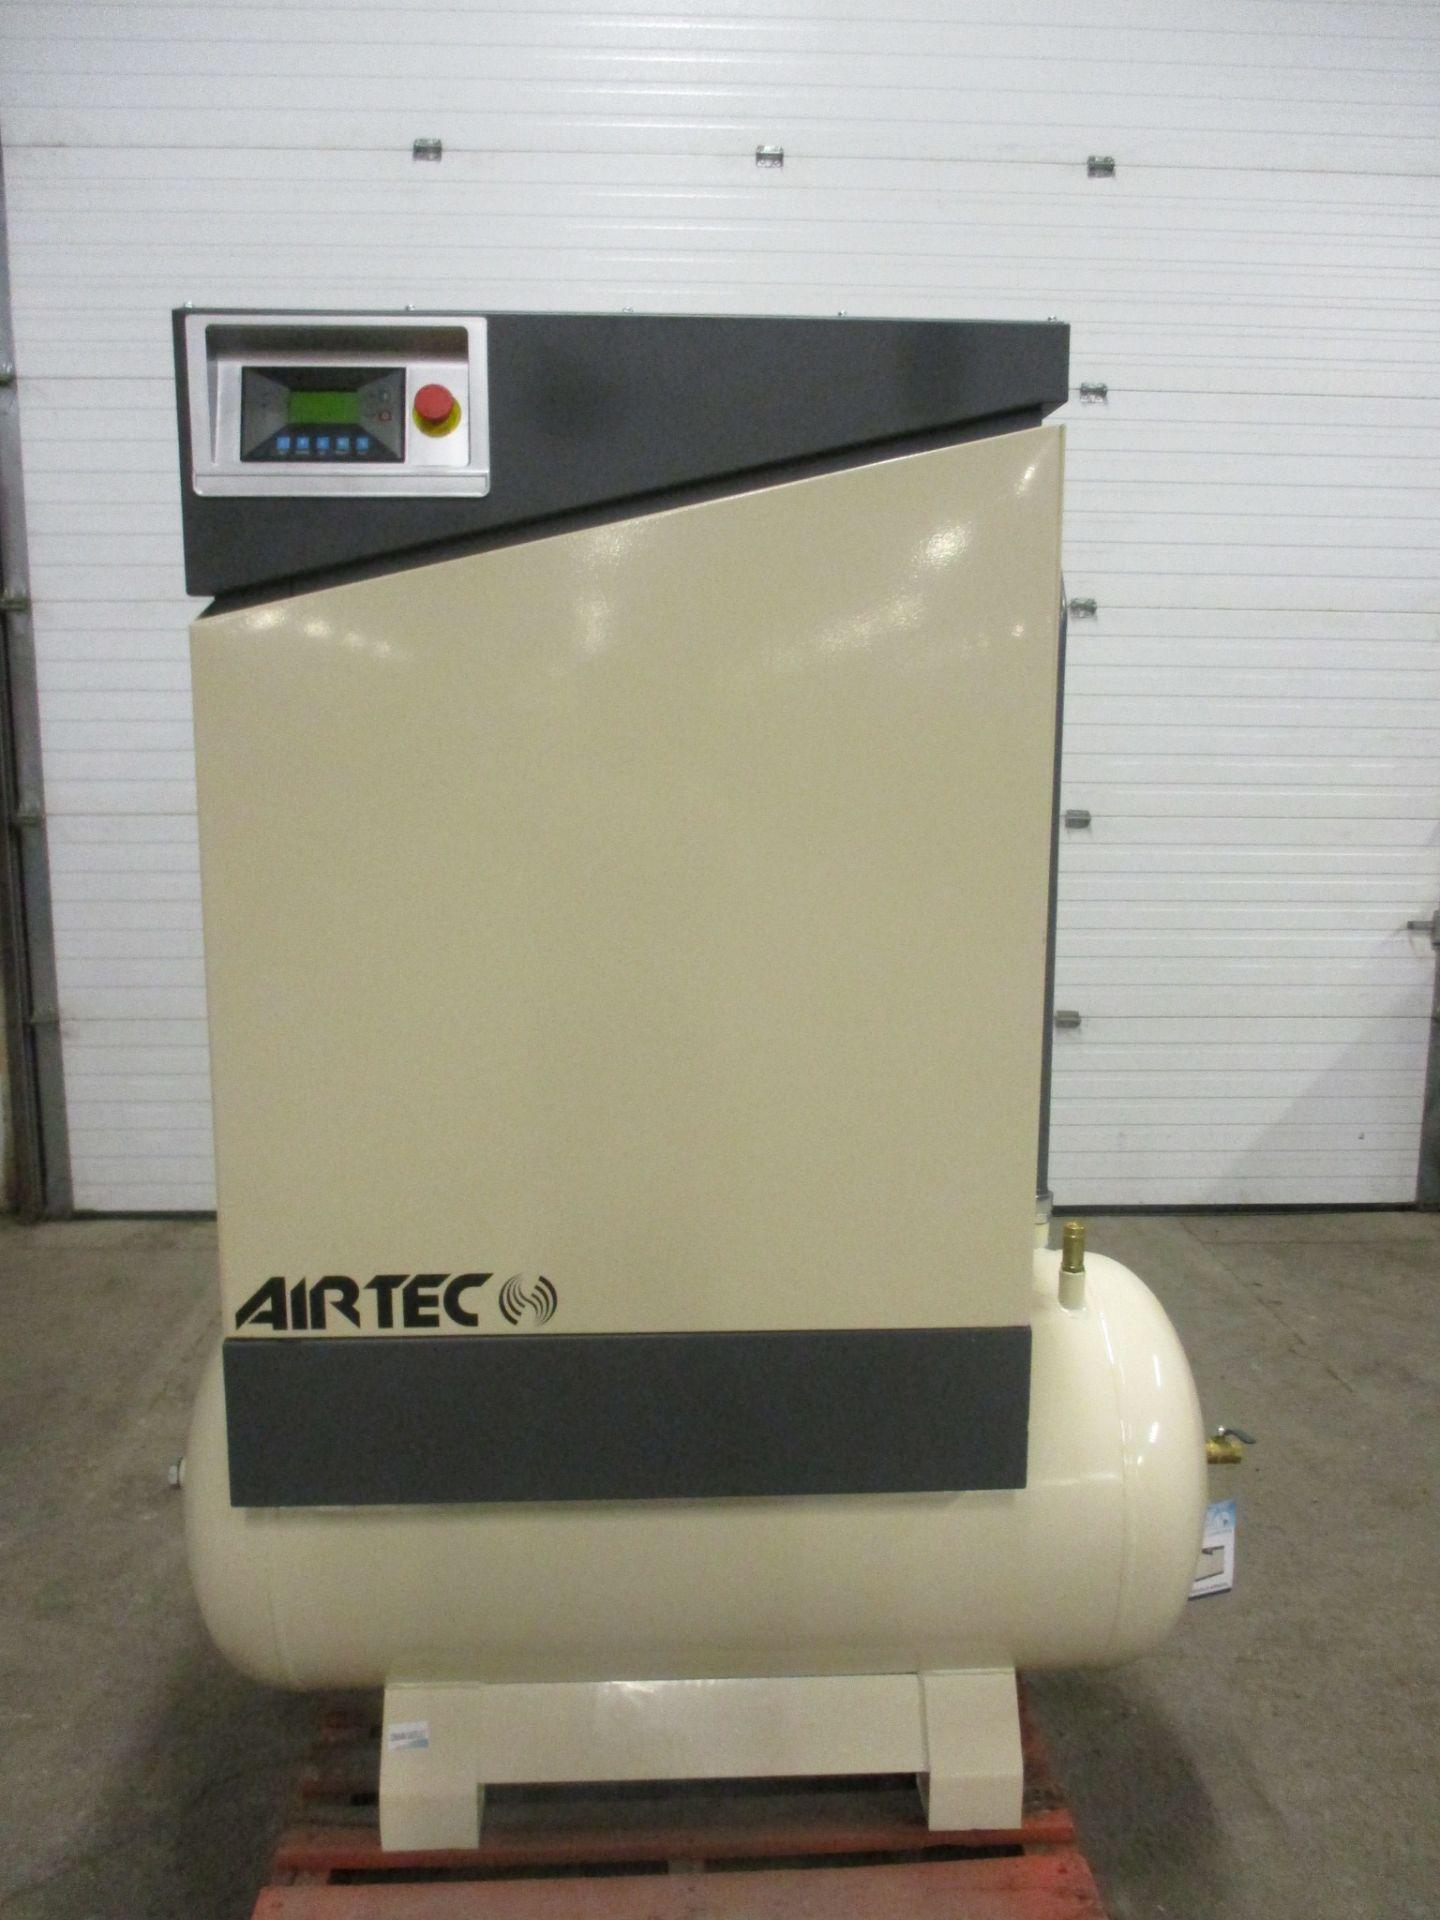 Lot 264 - Airtec 20HP Rotary Screw Air Compressor - MINT UNUSED COMPRESSOR with 80 gallon horizontal